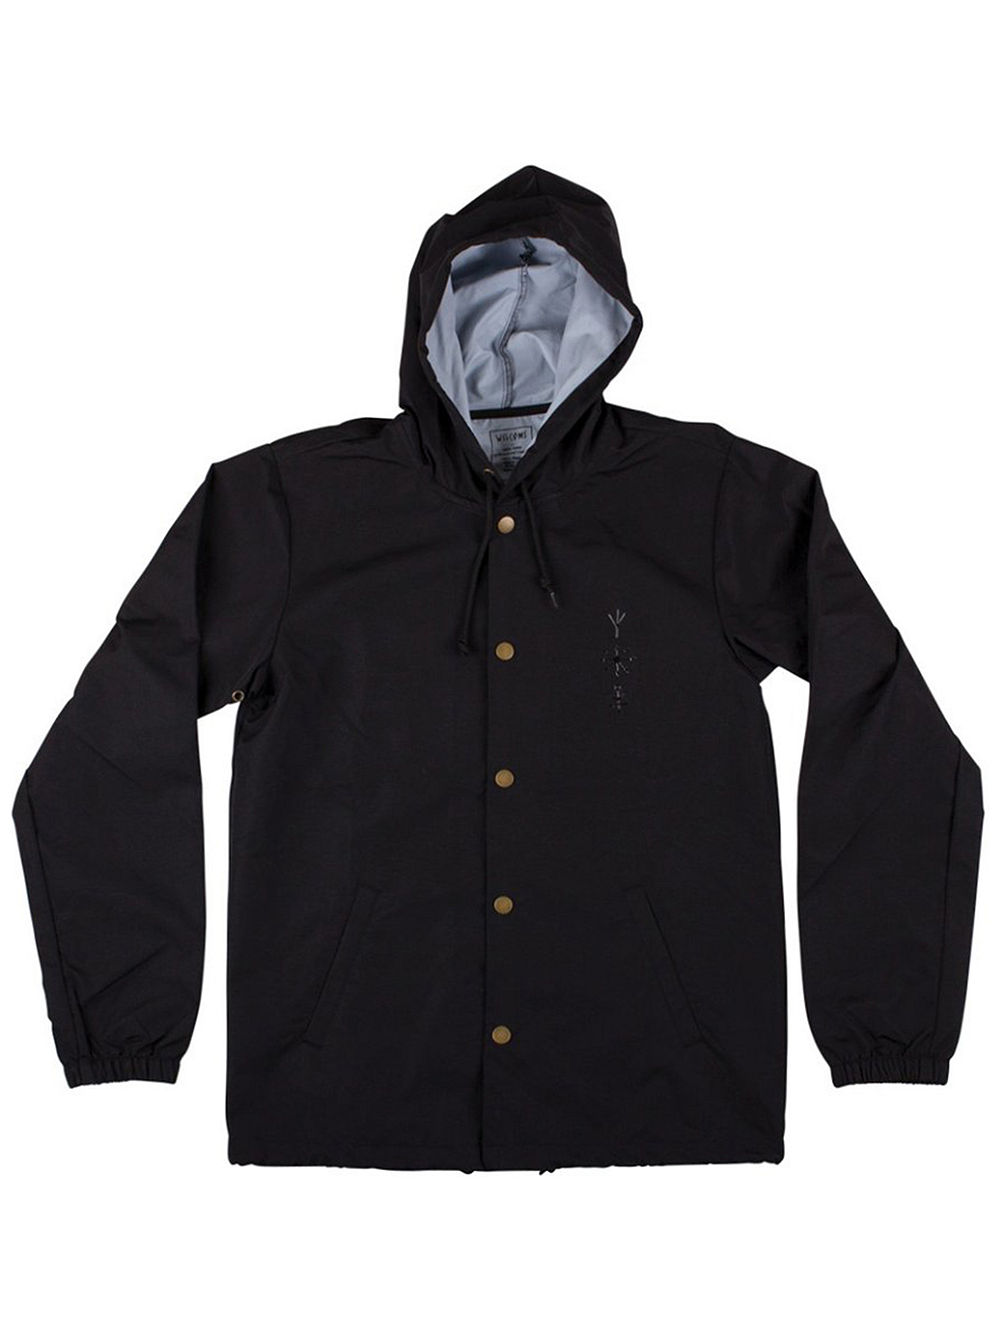 welcome-talisman-jacket